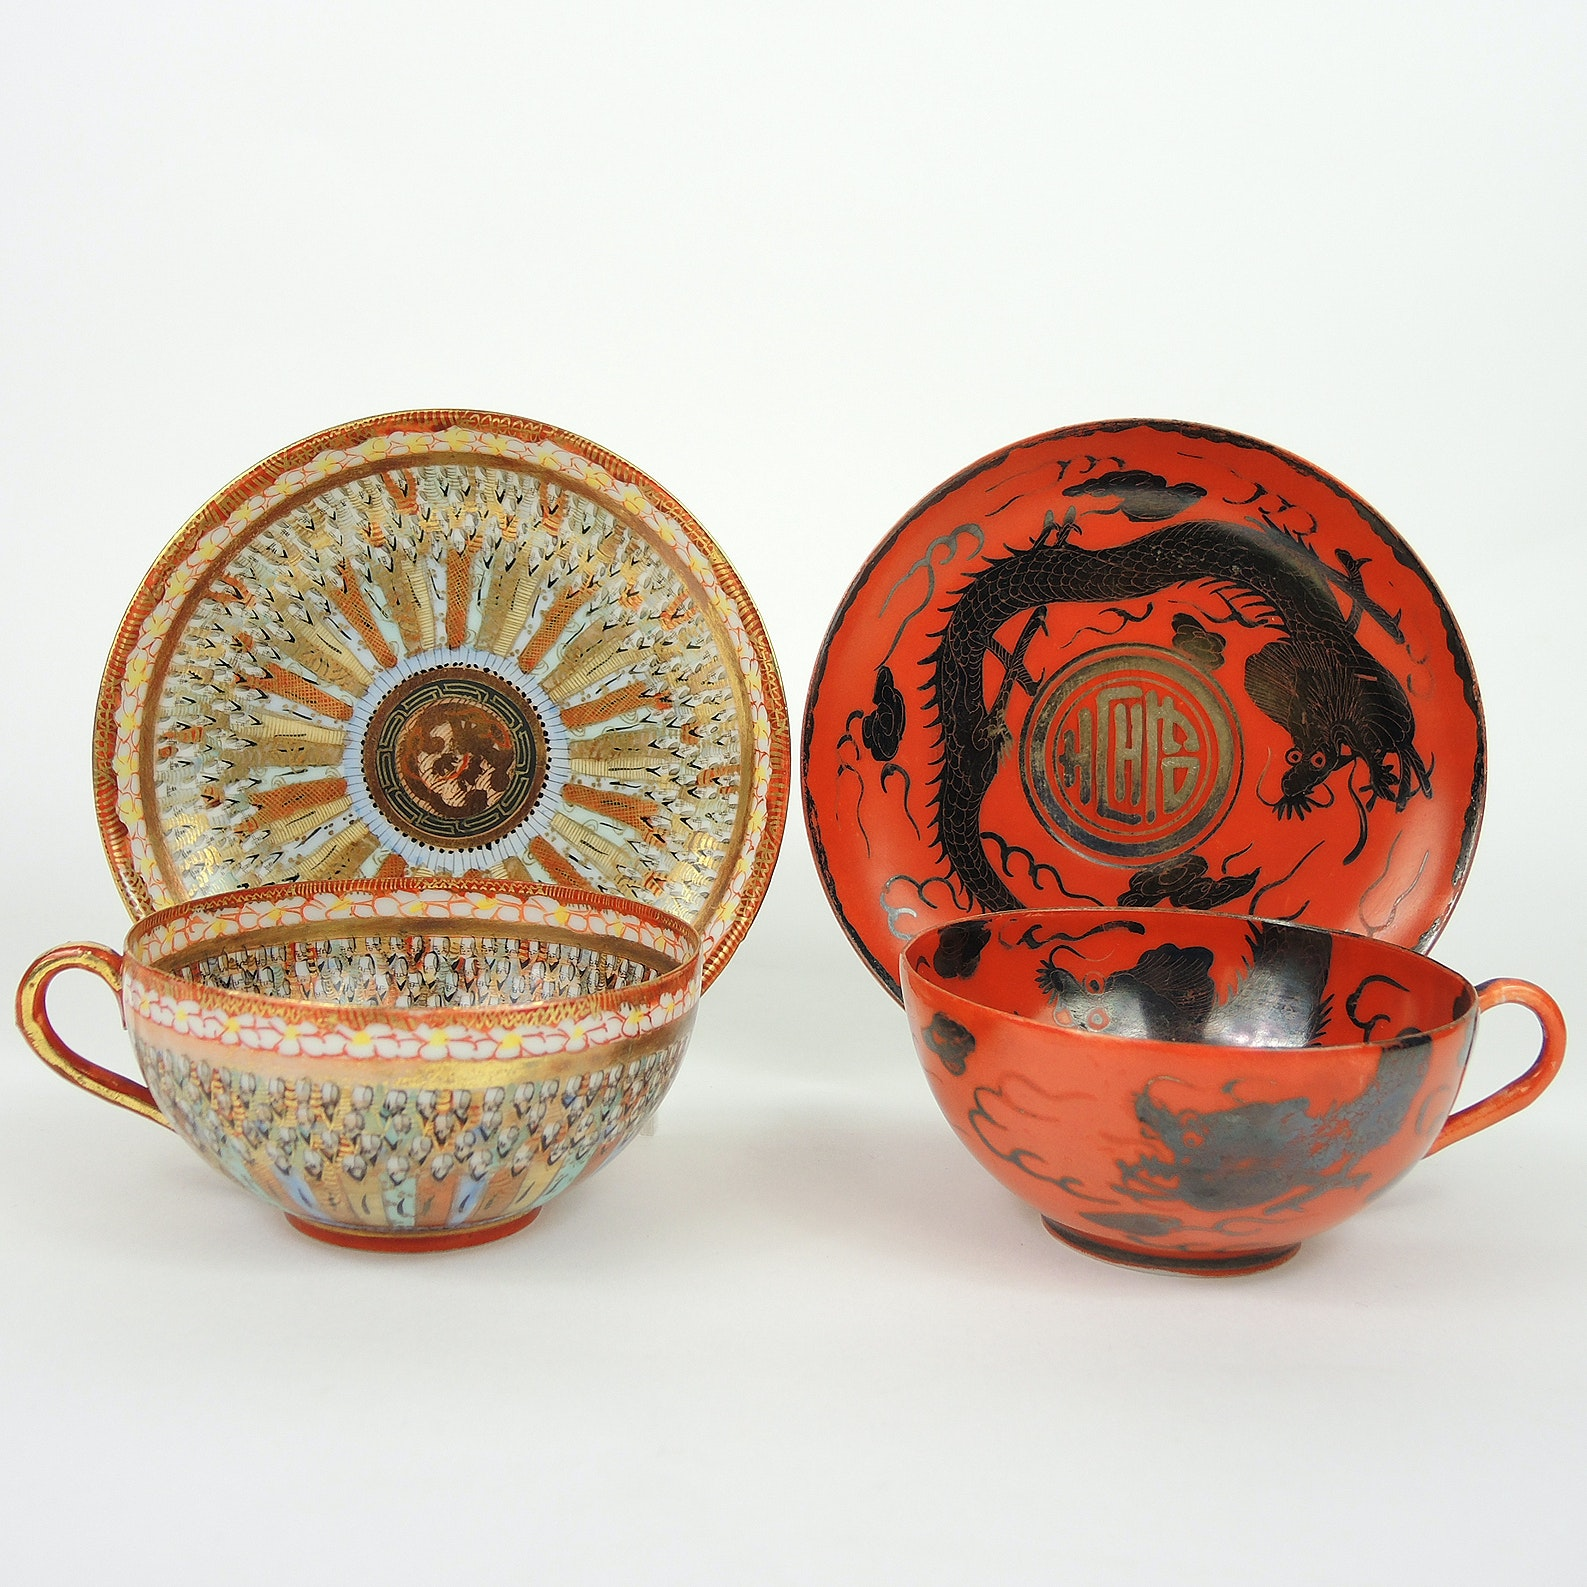 Antique Meiji Period Japanese Porcelain Teacups